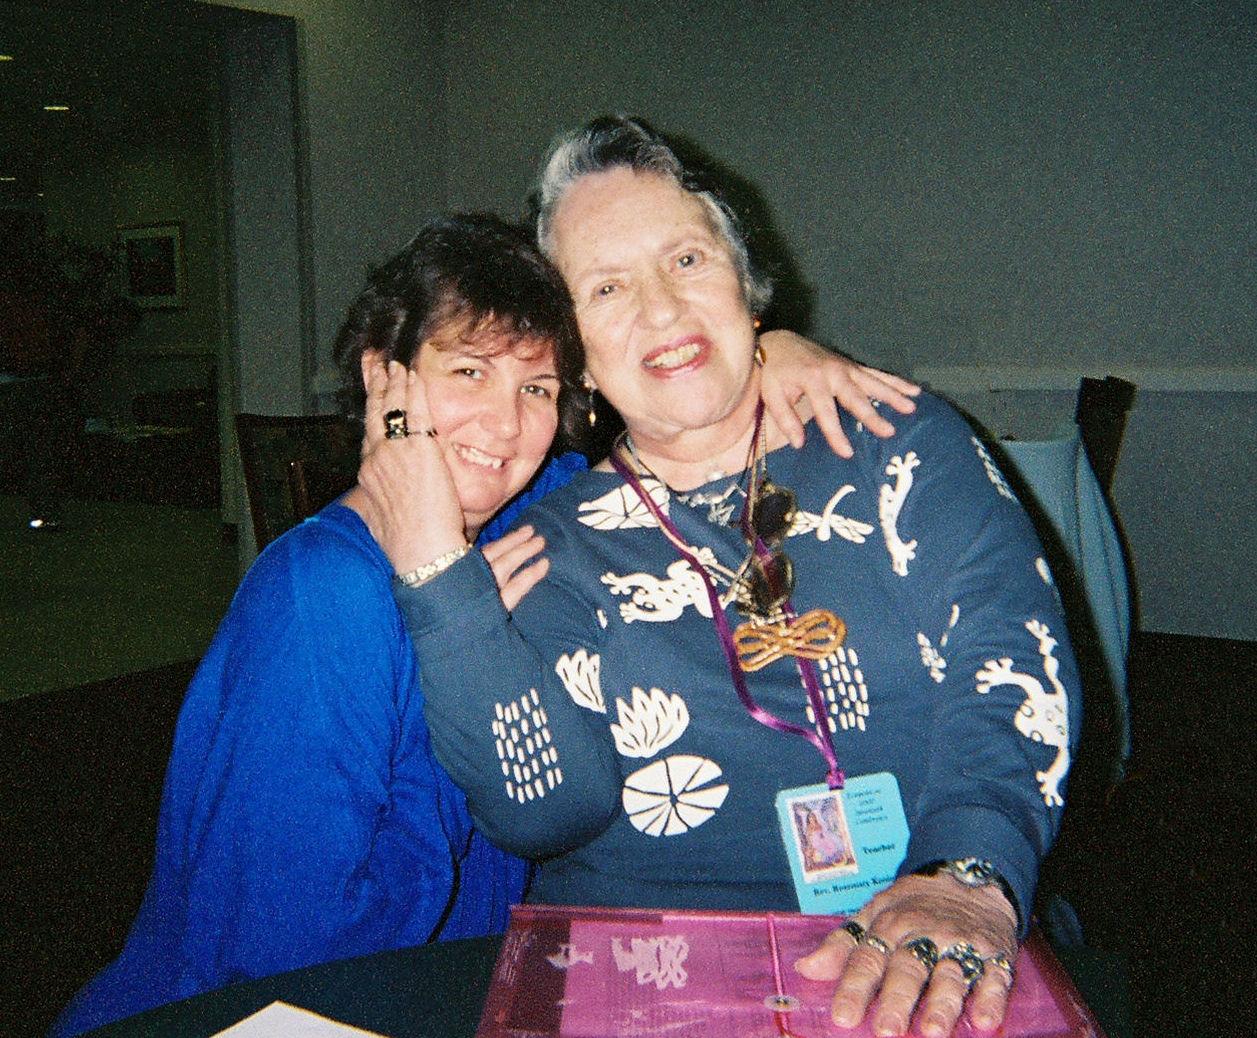 Rosemary and Osh